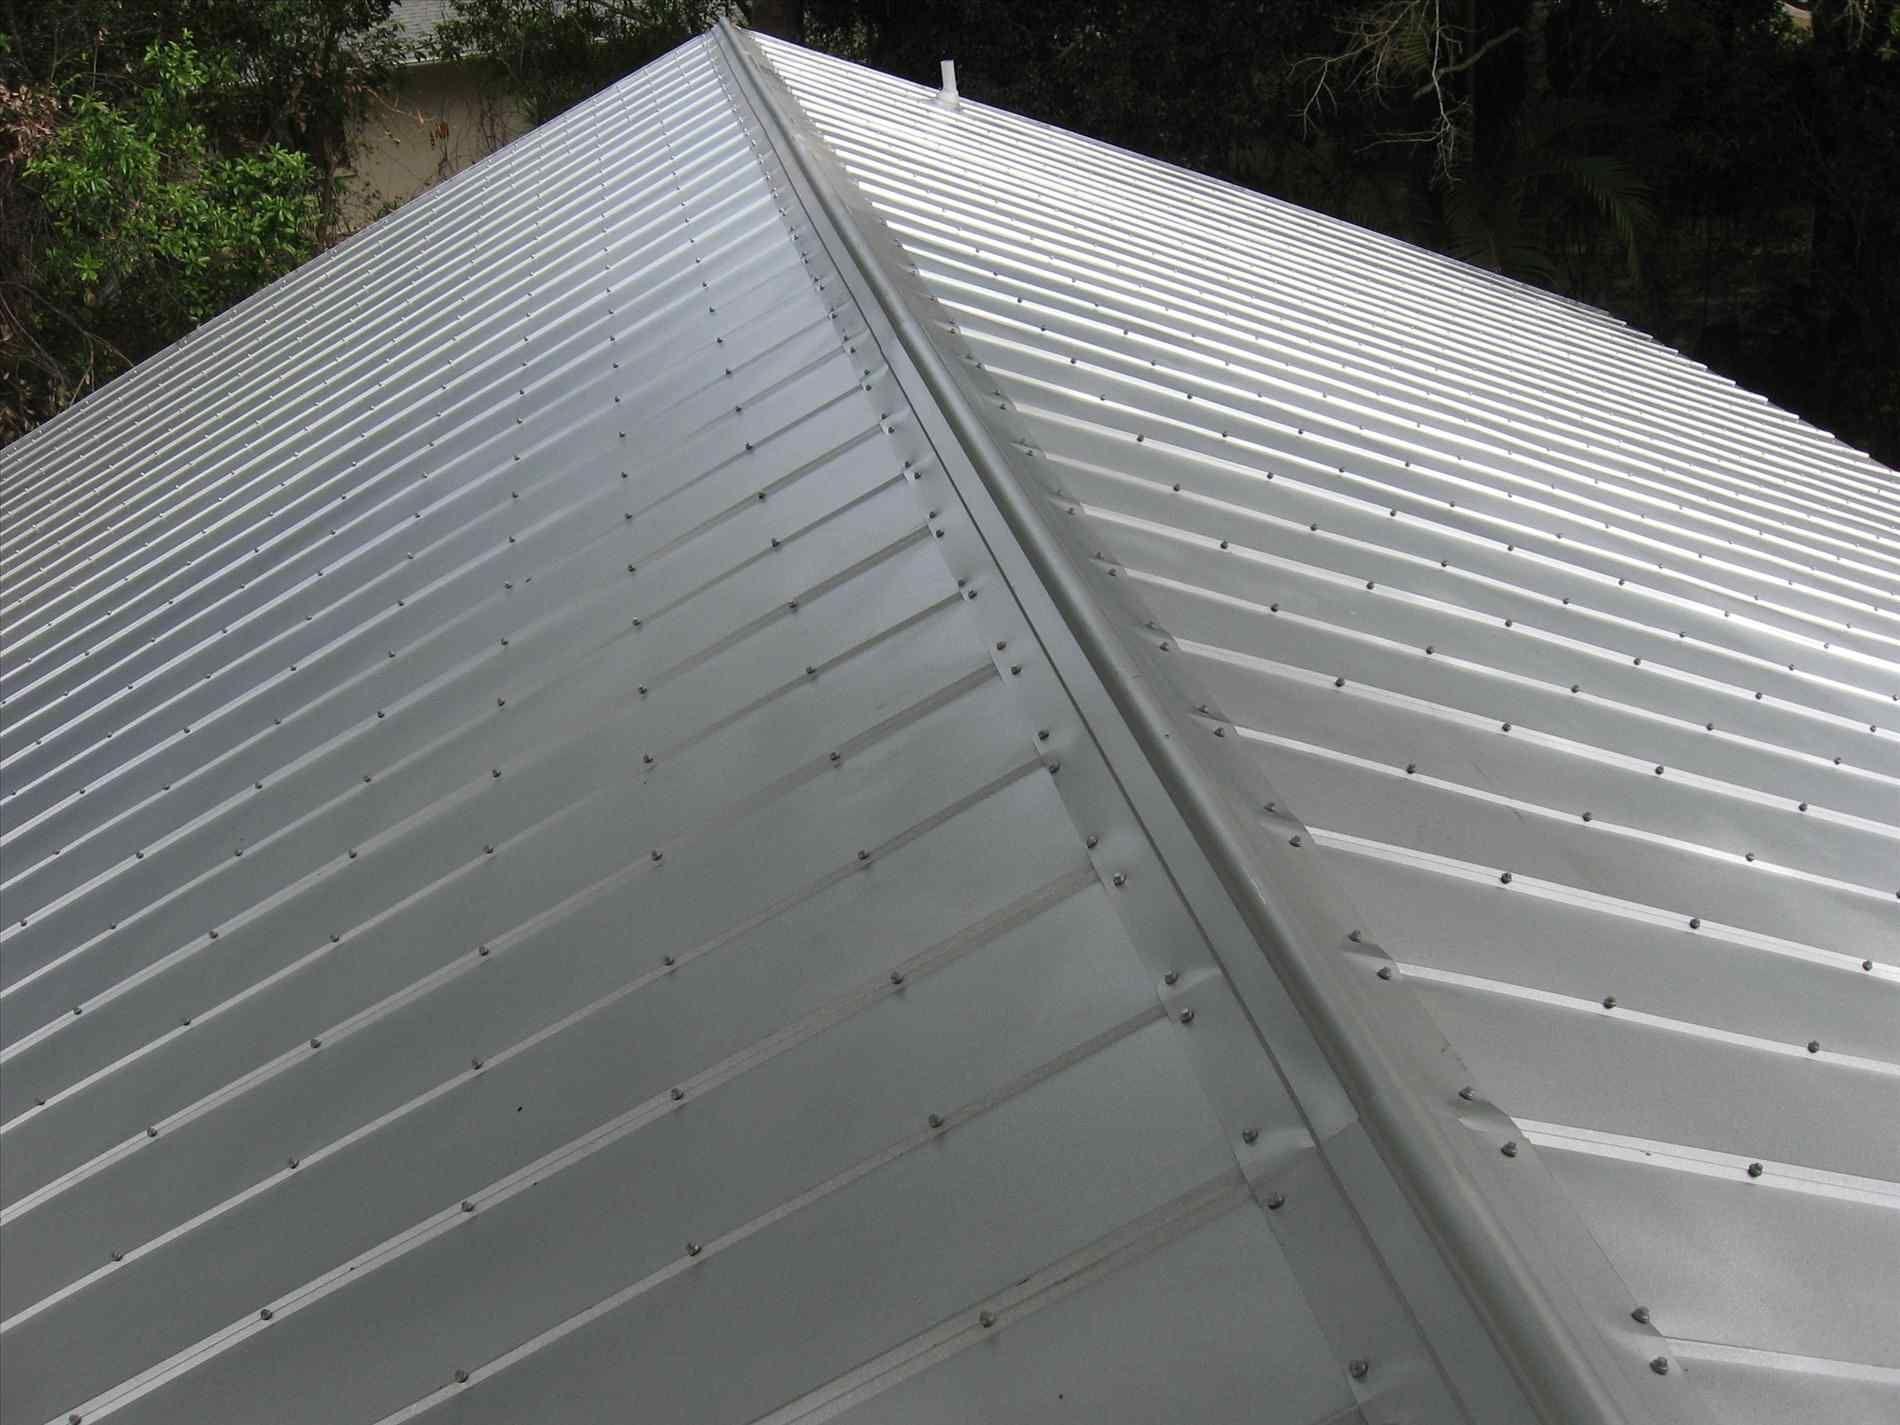 5V Crimp Metal Roofing Metal roof, Metal roofing prices